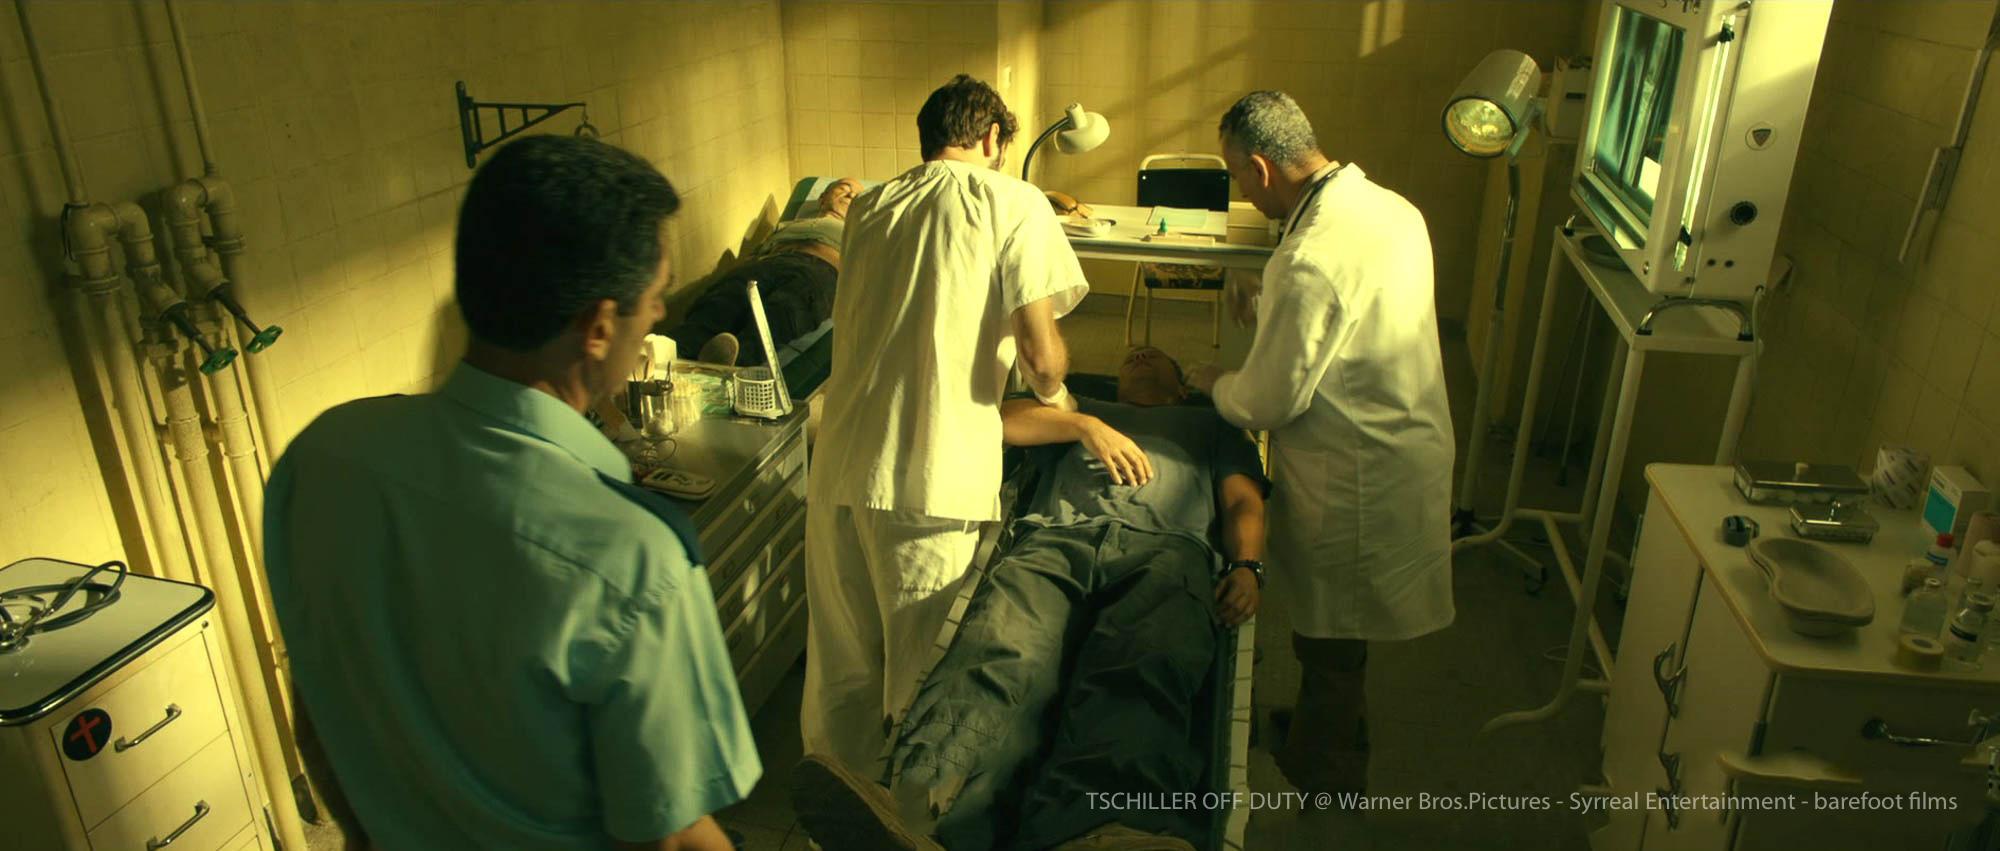 Tschiller off duty Regie Christian Alvart Til Schweiger Thomas Freudenthal Szenenbild Production Design Hamburg Germany Istanbul Moskau Moskow